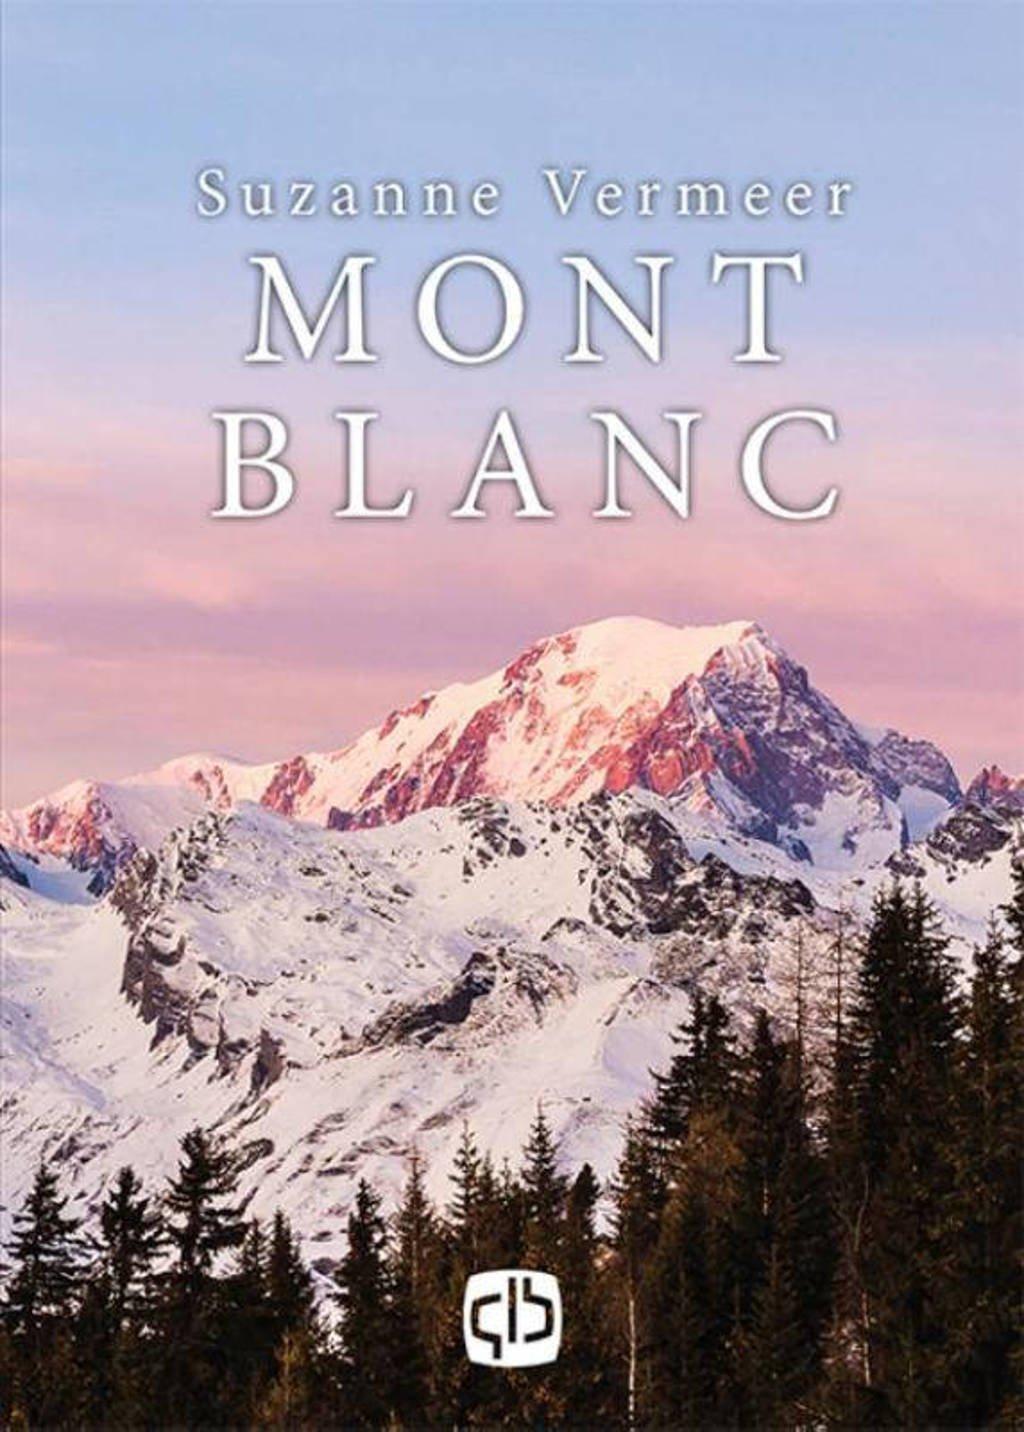 Mont blanc - A.W. Bruna